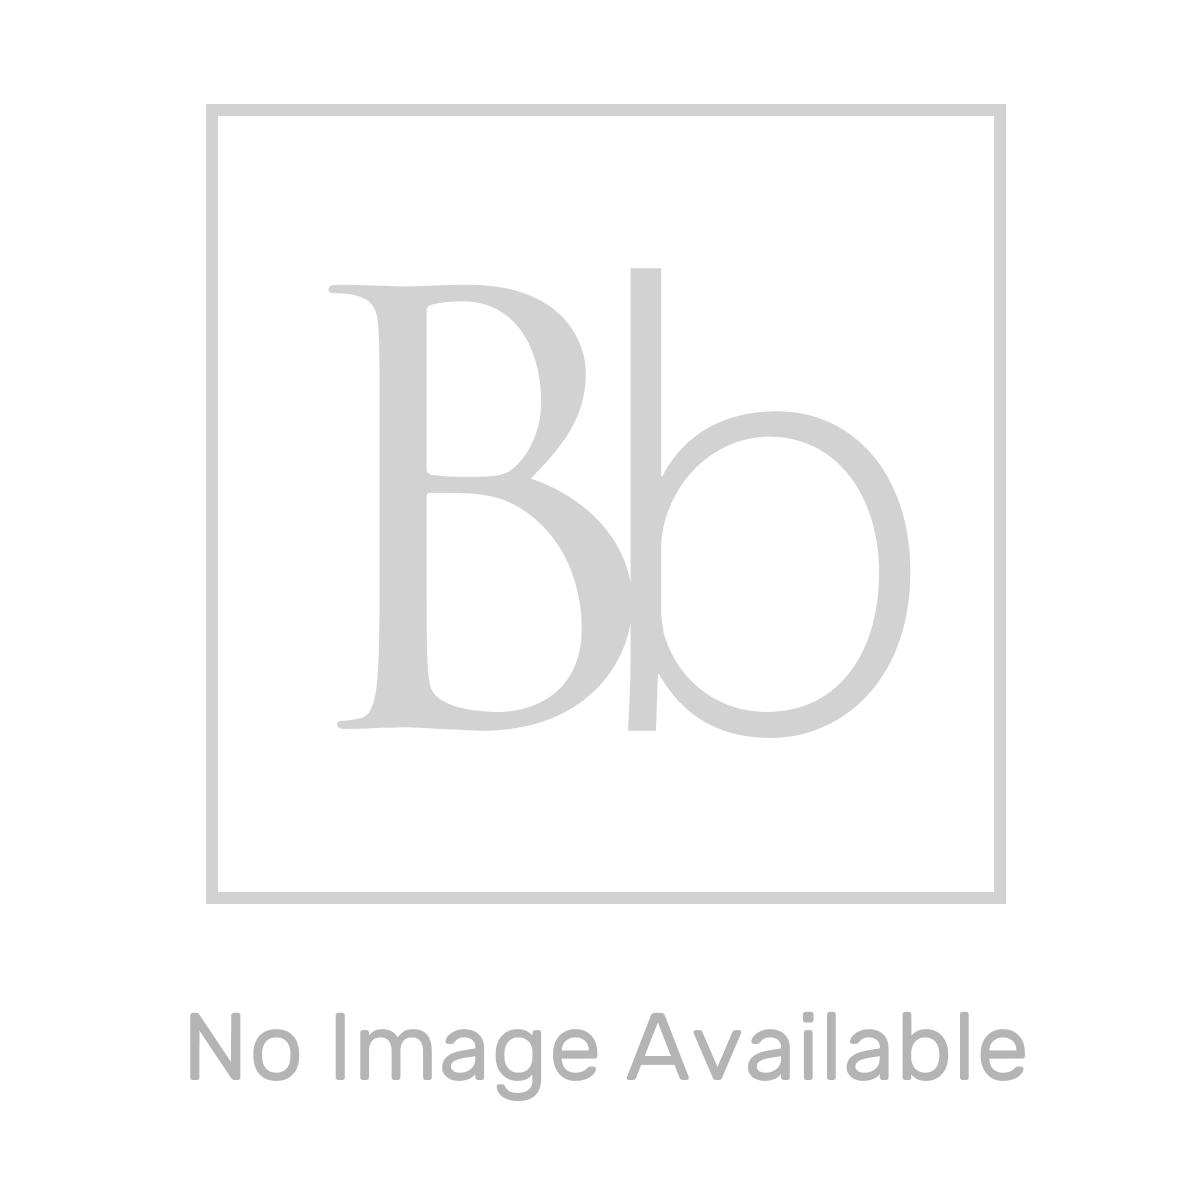 Premier 1 Tap Hole Standard Basin